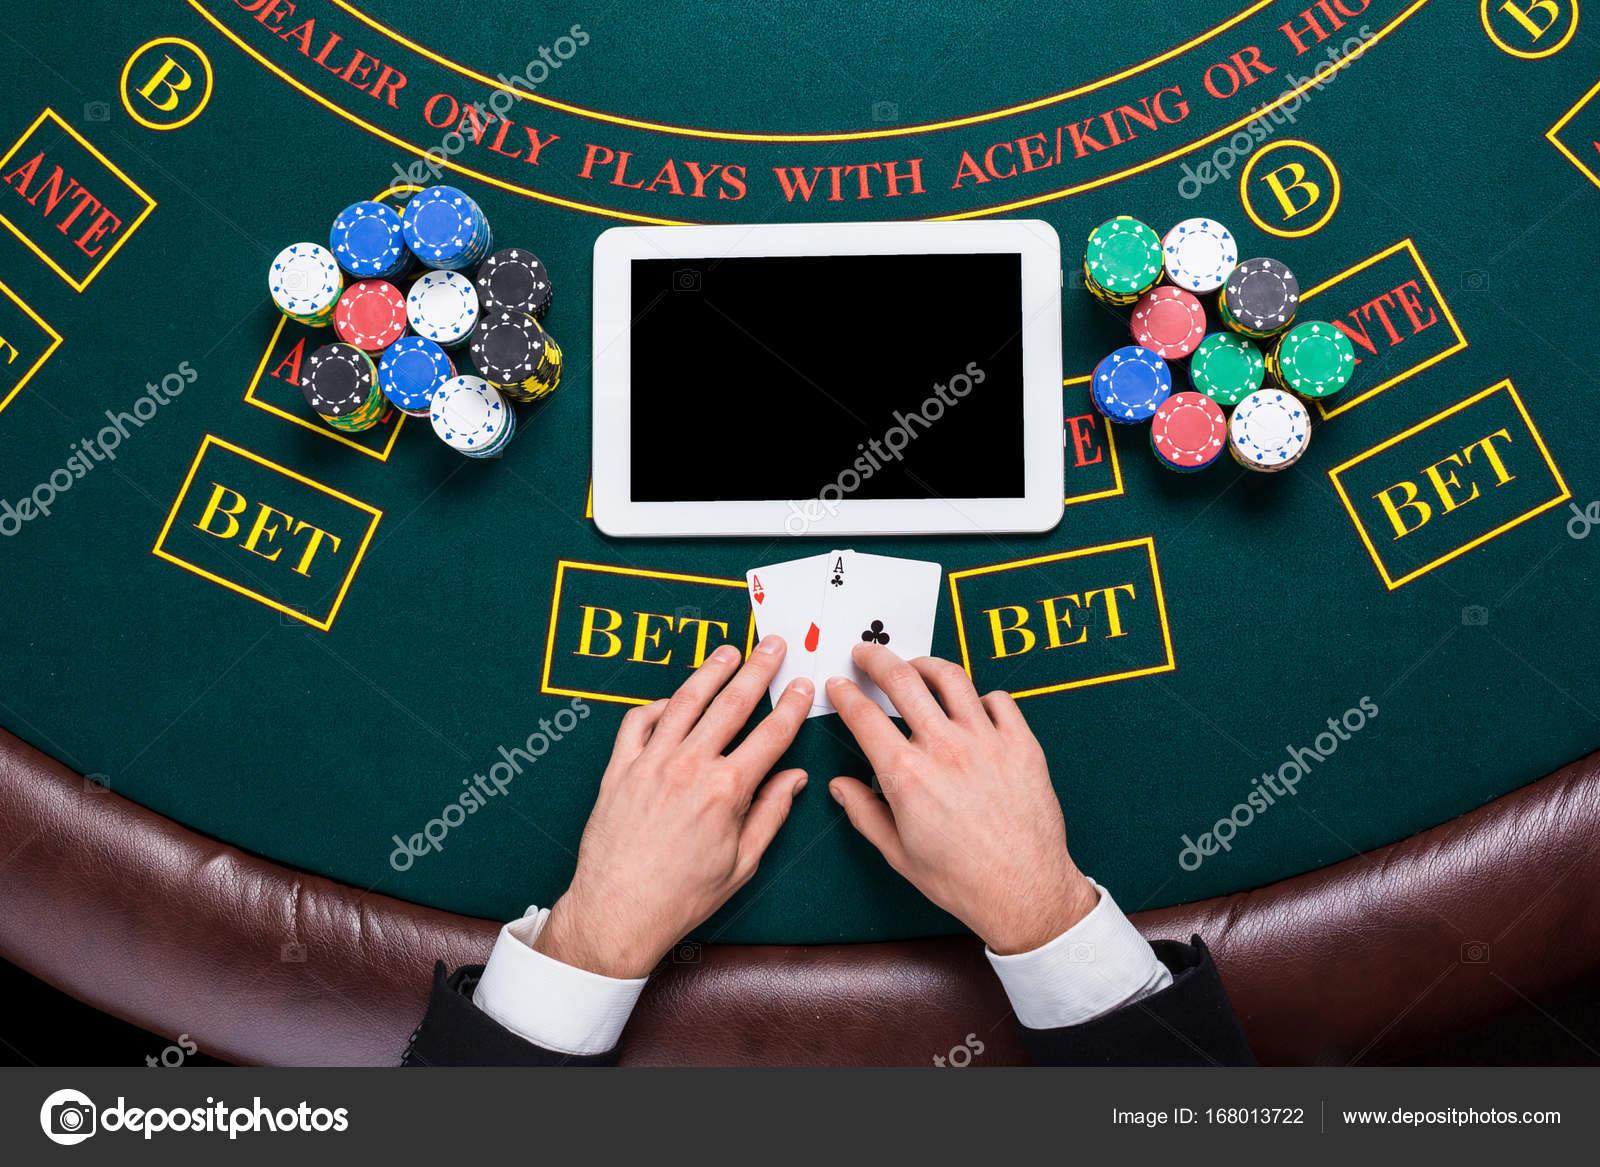 Superbahis mobile casino